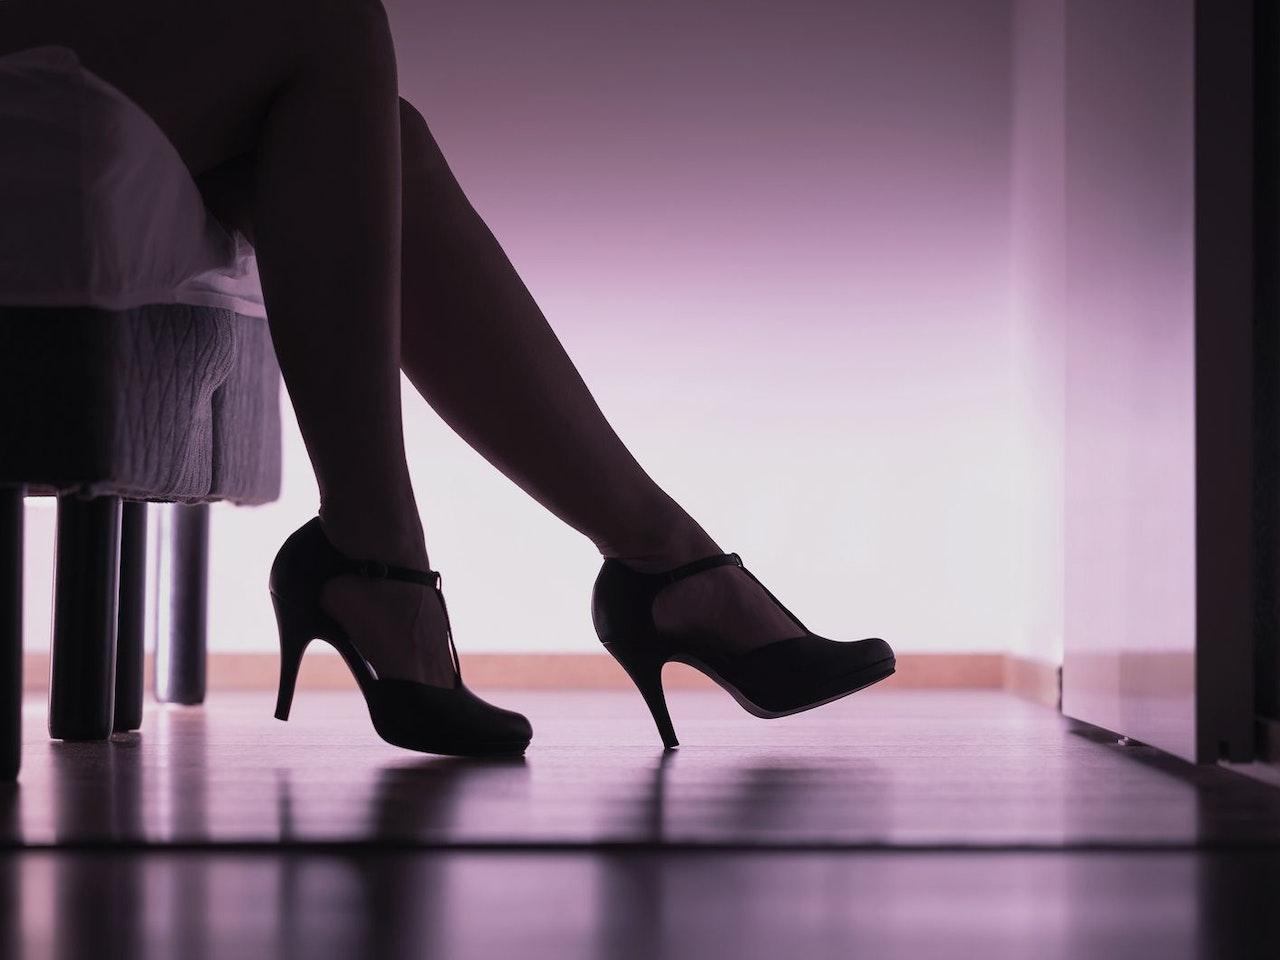 Innsbruck prostitution Prostitution